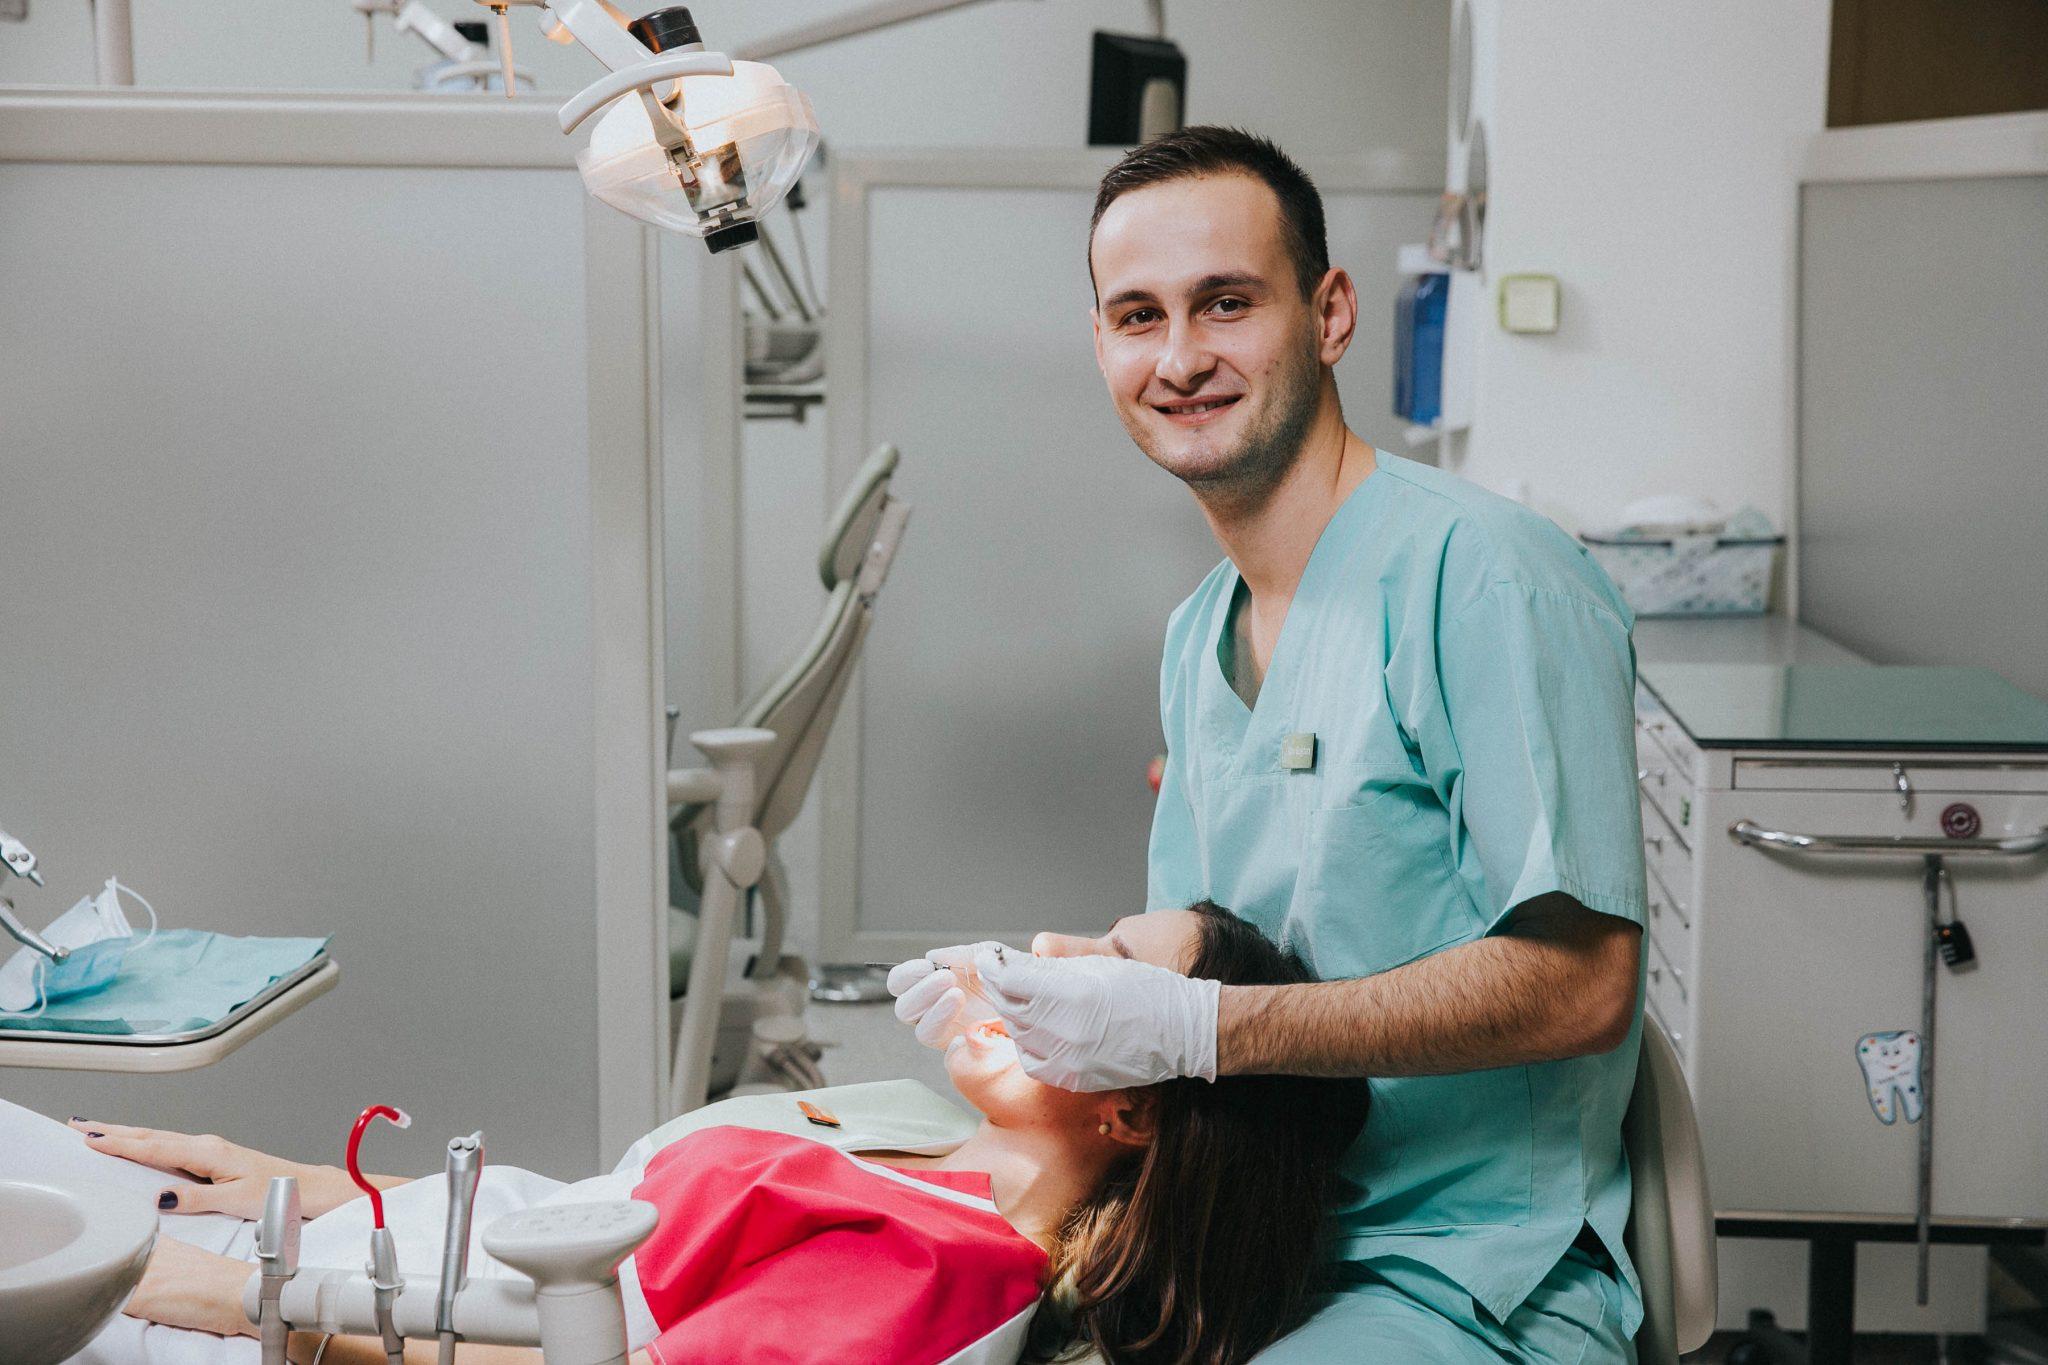 facultatea de stamatologie targu mures UMF absolvenit stamatolog medic doctor fotografie comerciala fotograf profesionist majos daniel_-5